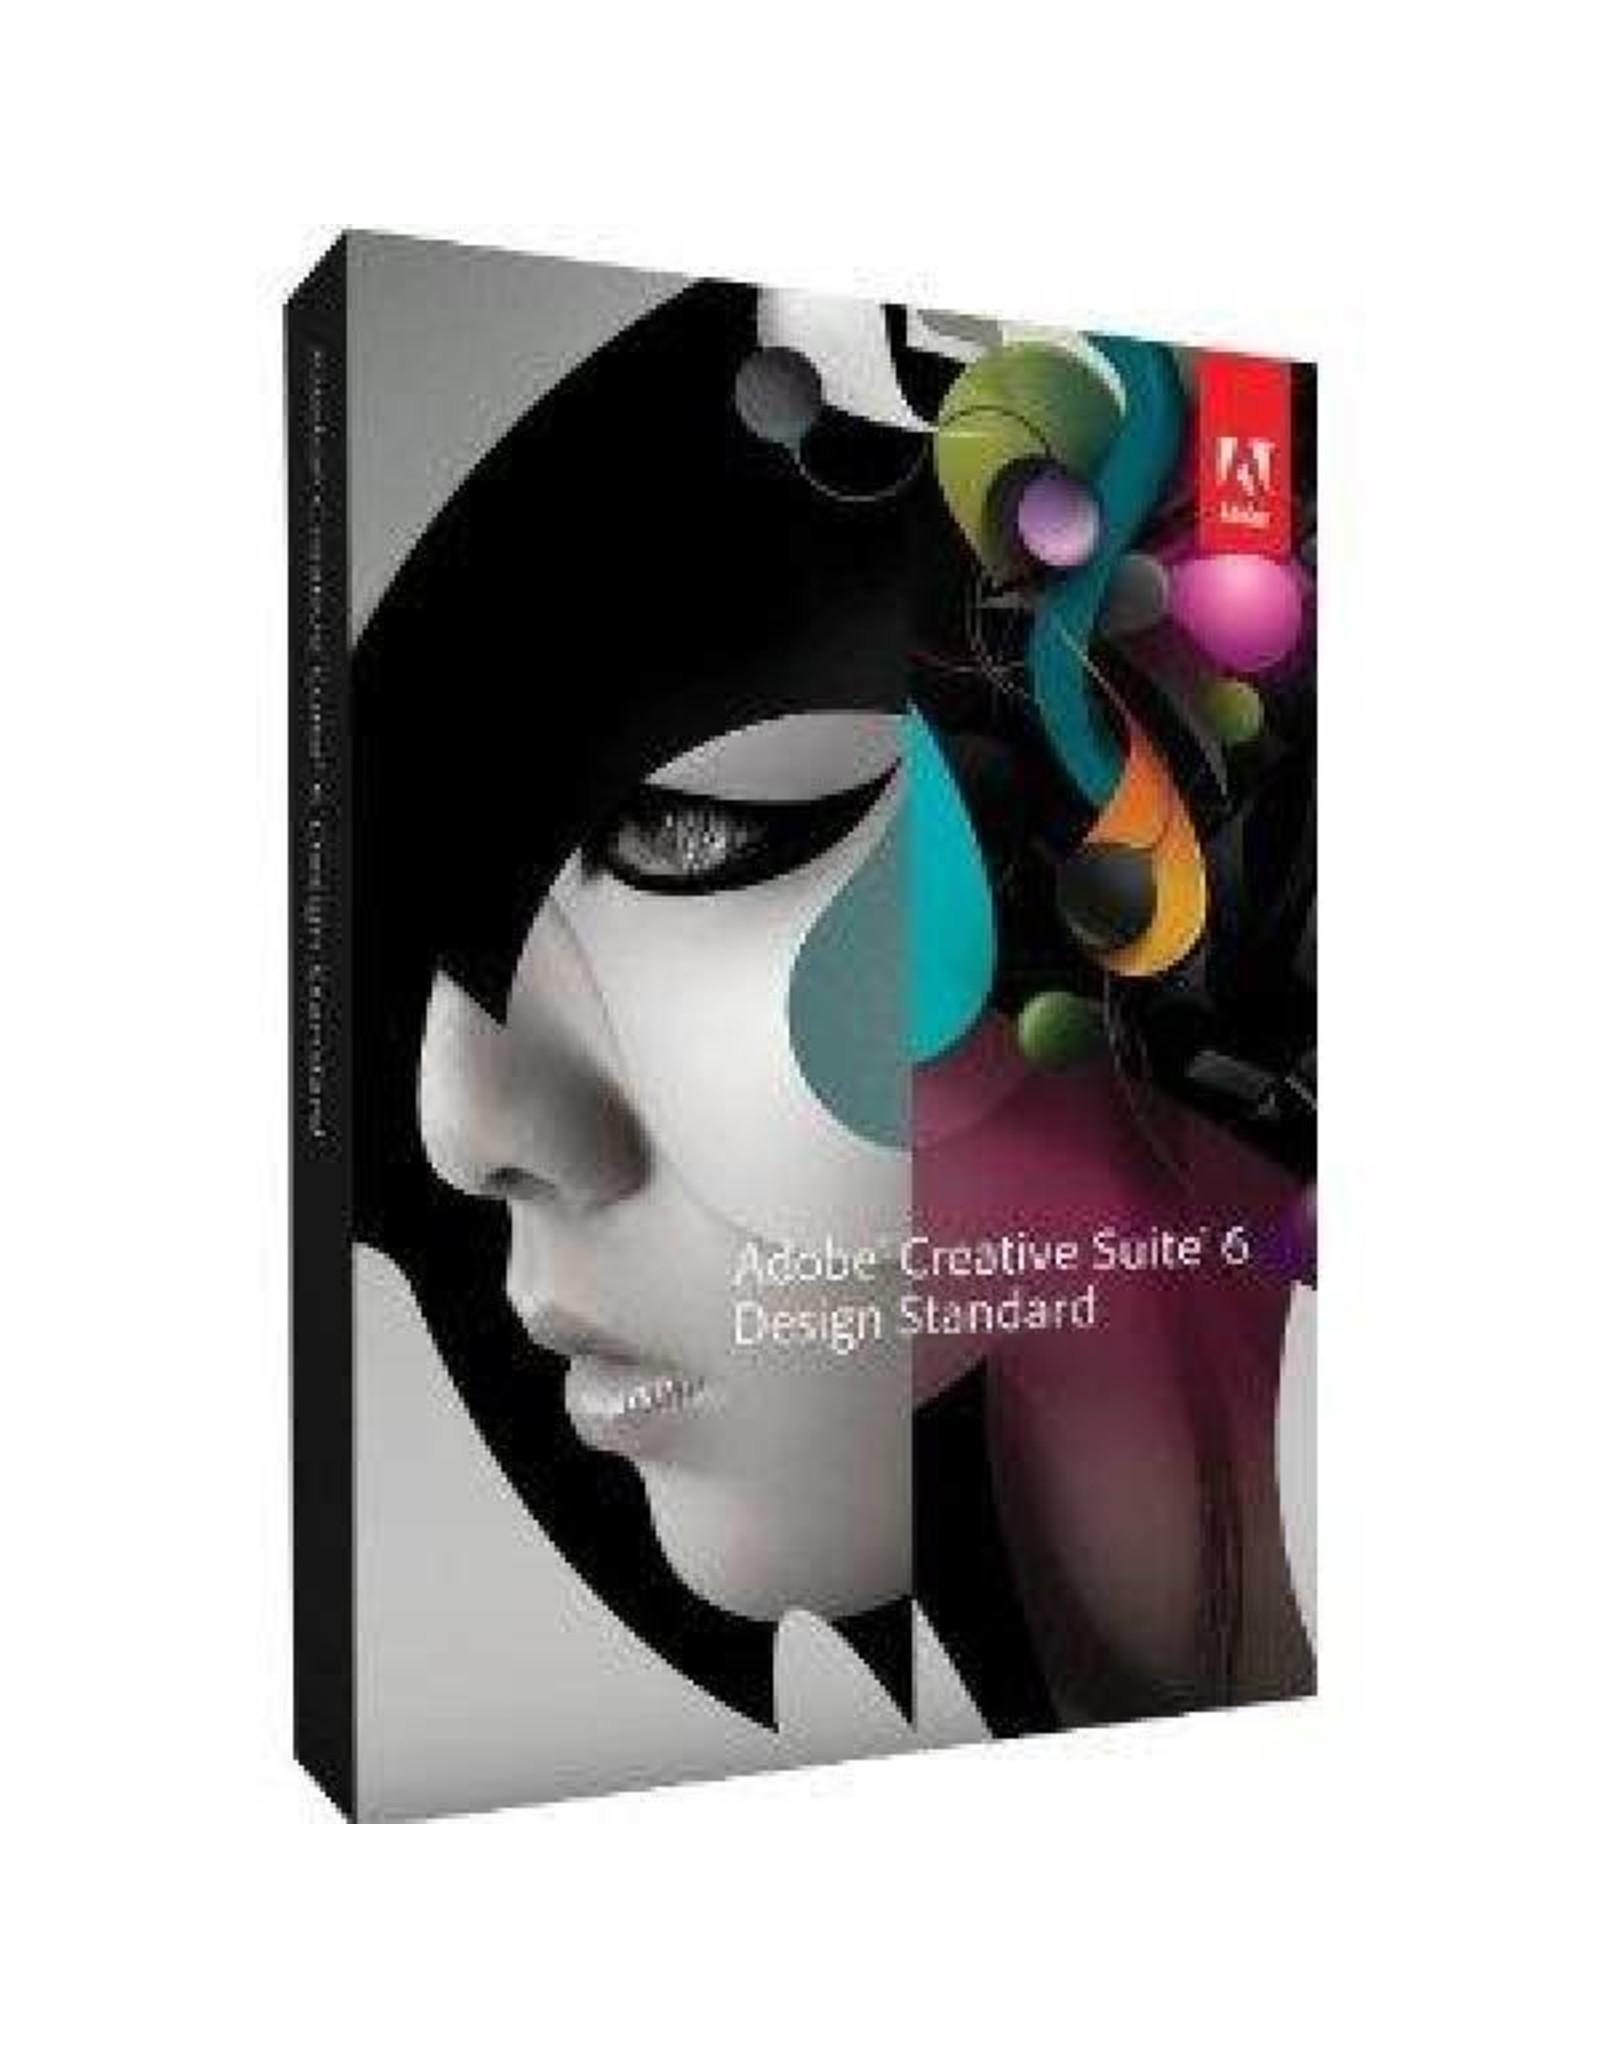 Adobe Adobe Creative Suite CS6 Design Standard Windows